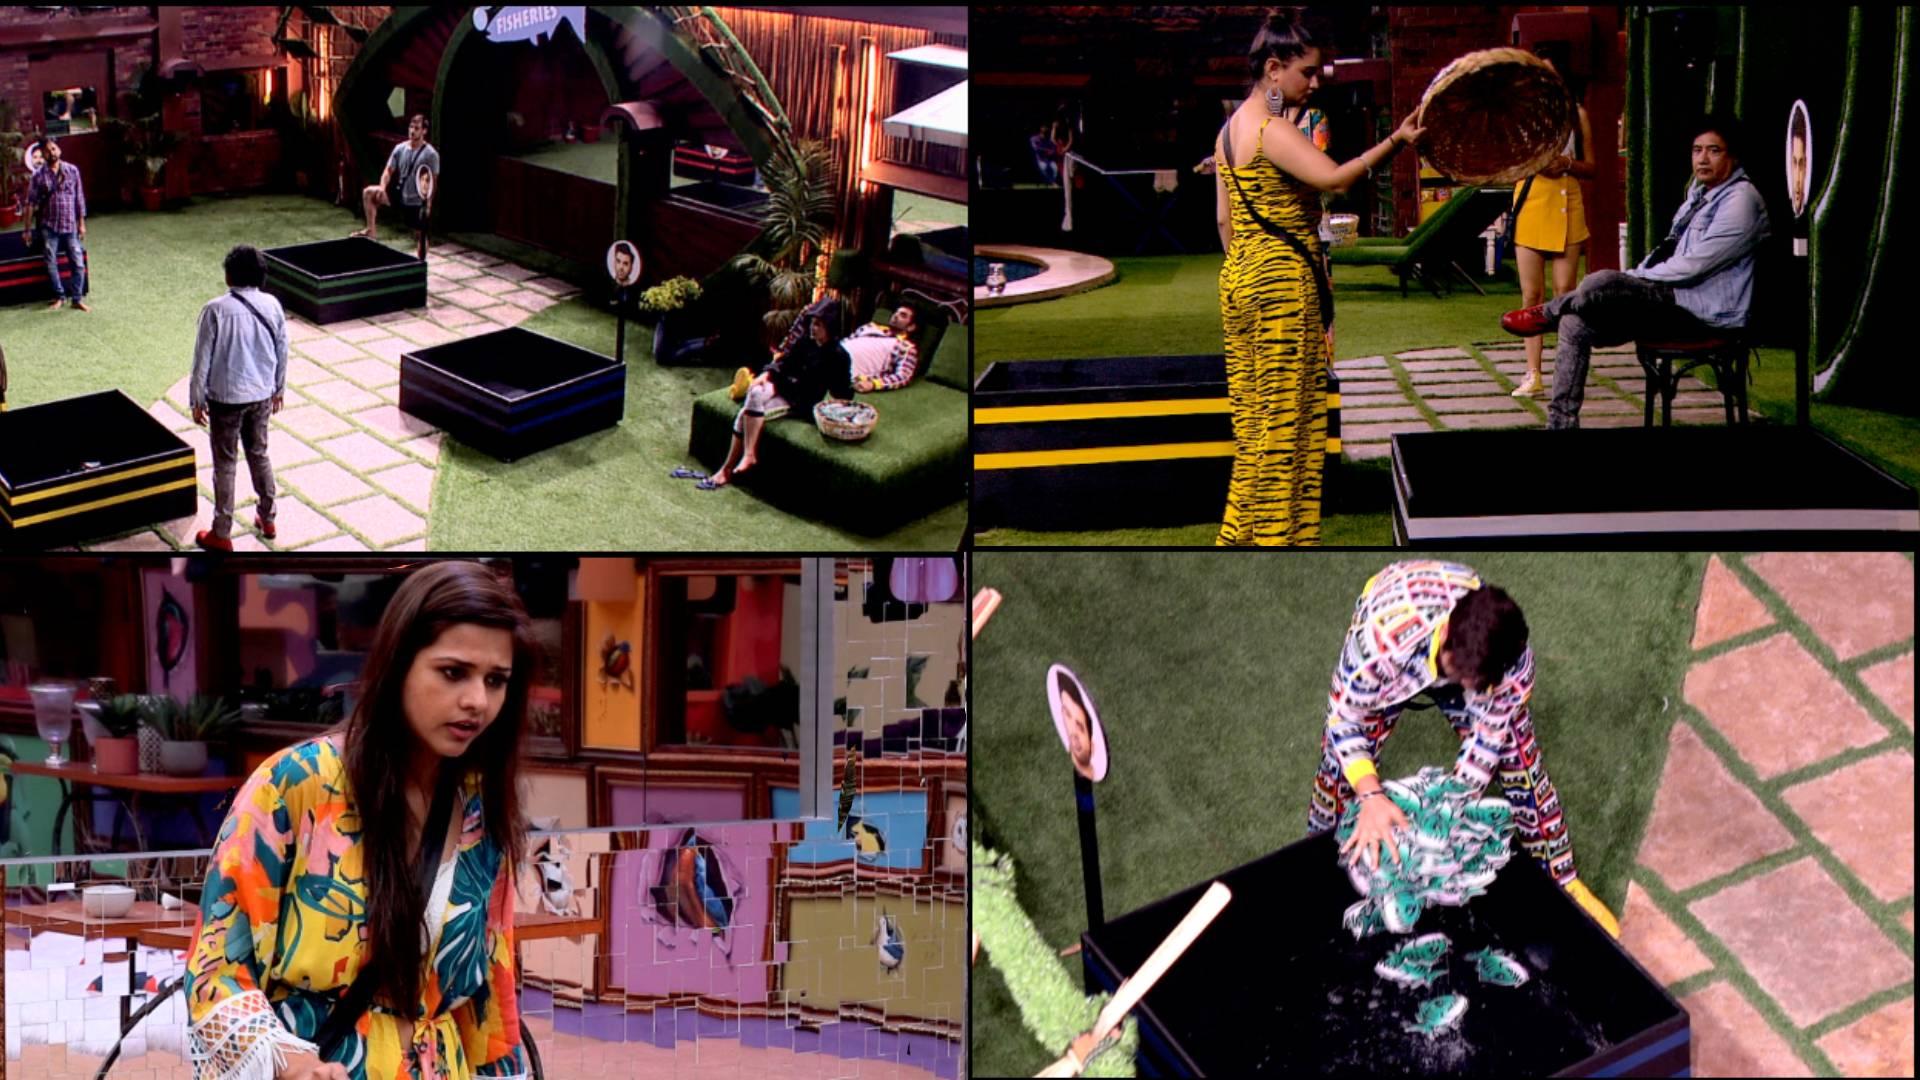 Bigg Boss 13 Bulletin Day 13: माहिरा शर्मा ने सिद्धार्थ शुक्ला को कहा बदतमीज, शहनाज-कोएना मित्रा में हुई बहस